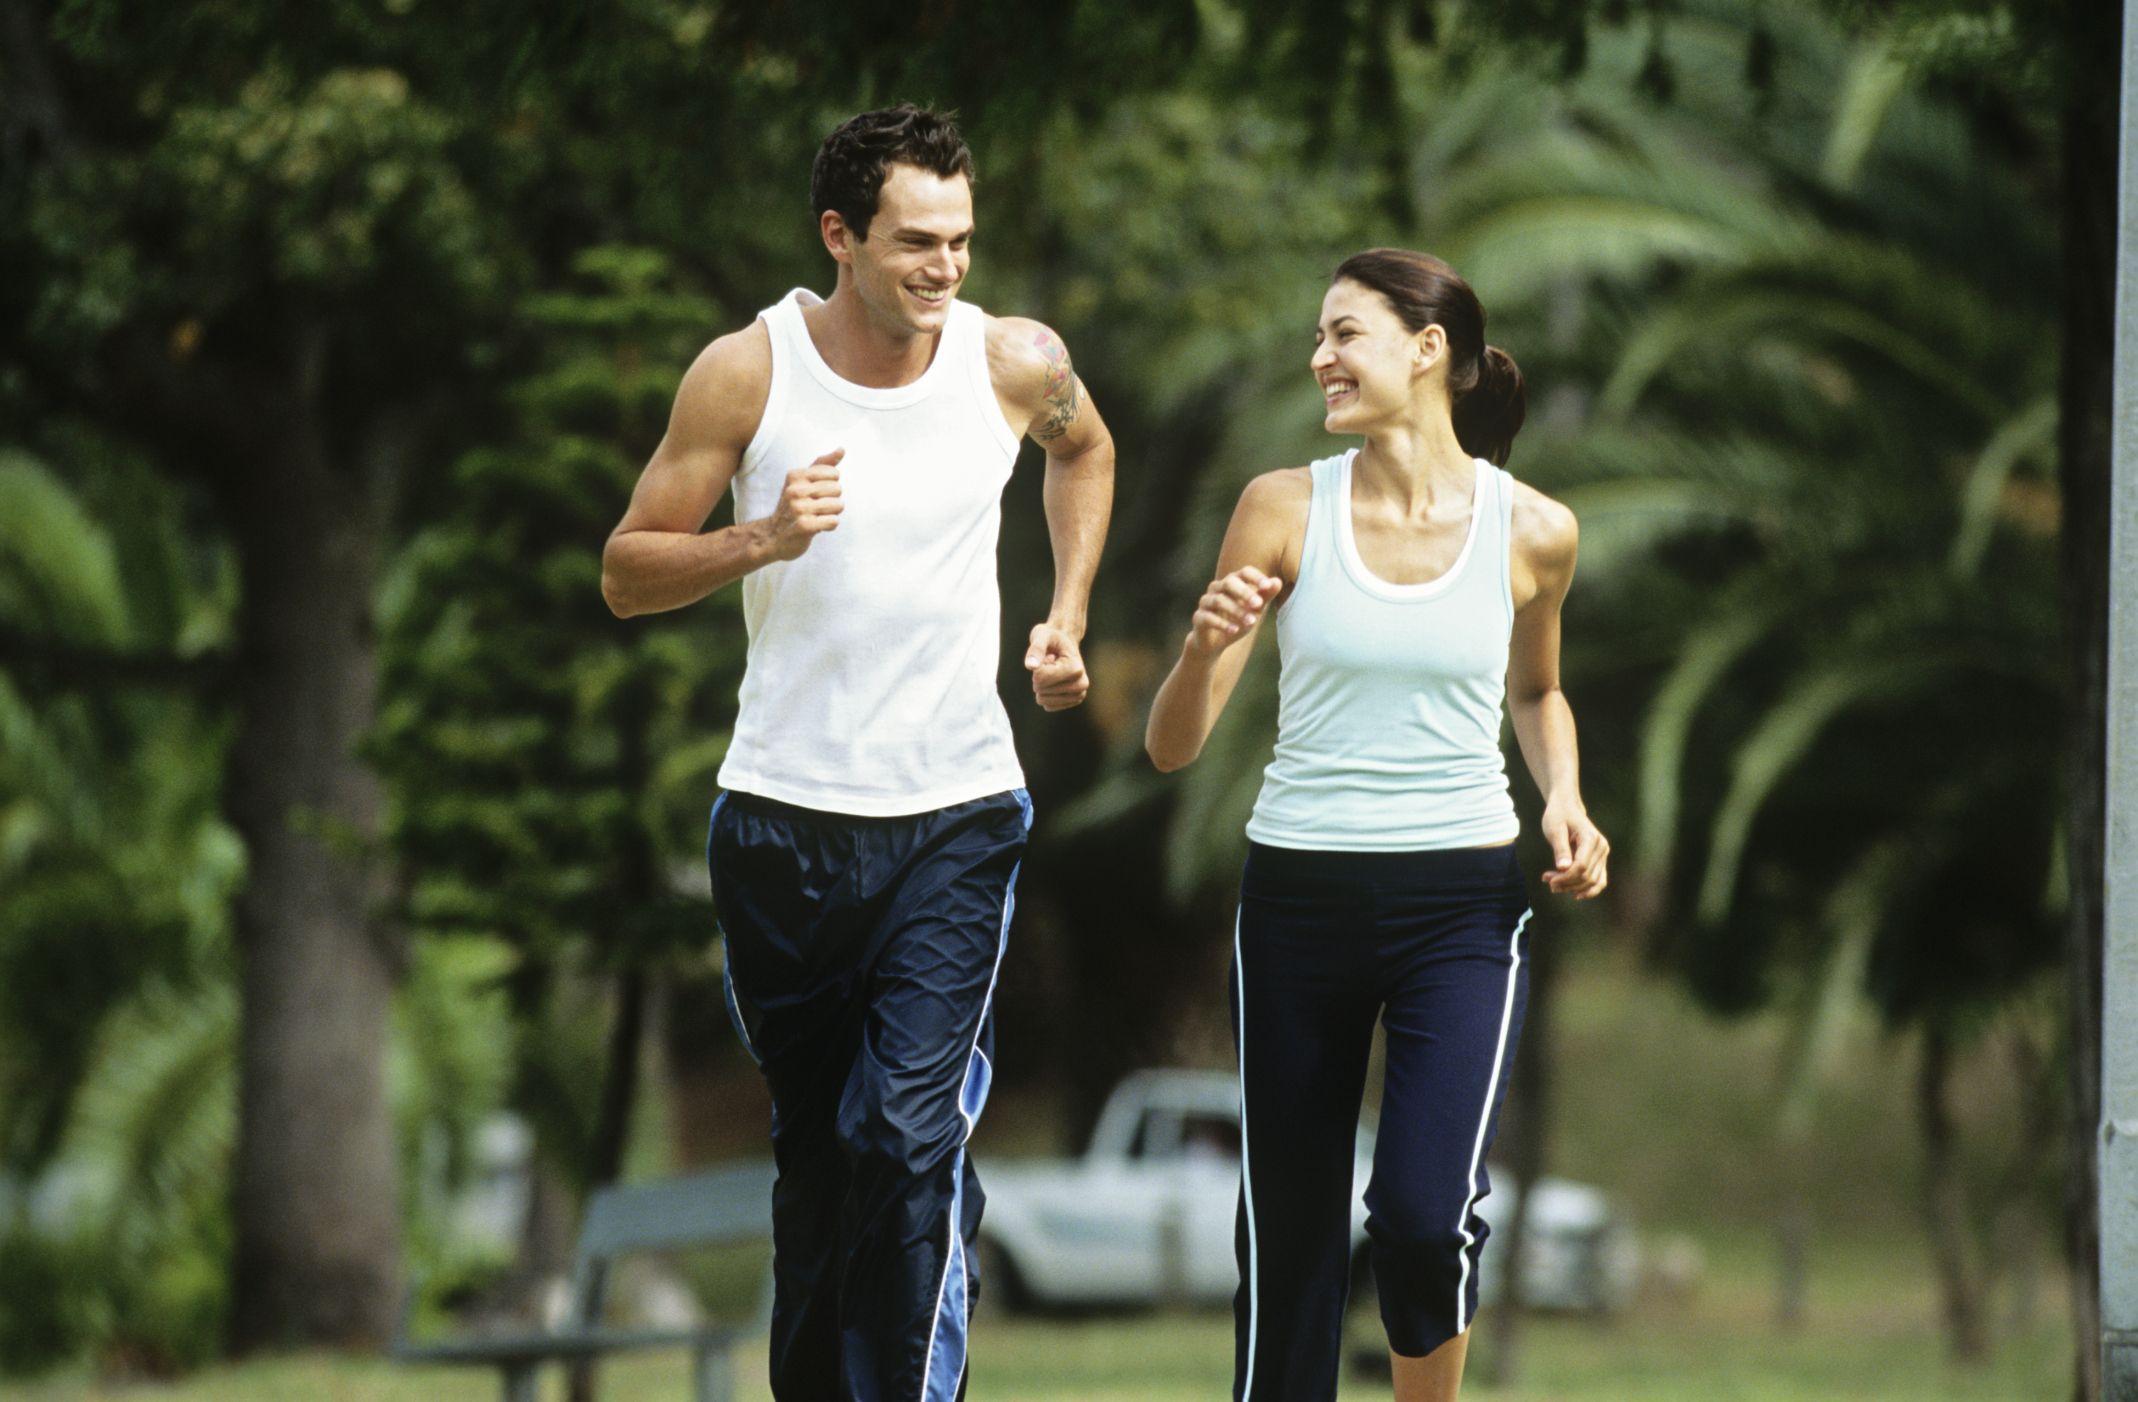 running Erotic jogging anal boy story